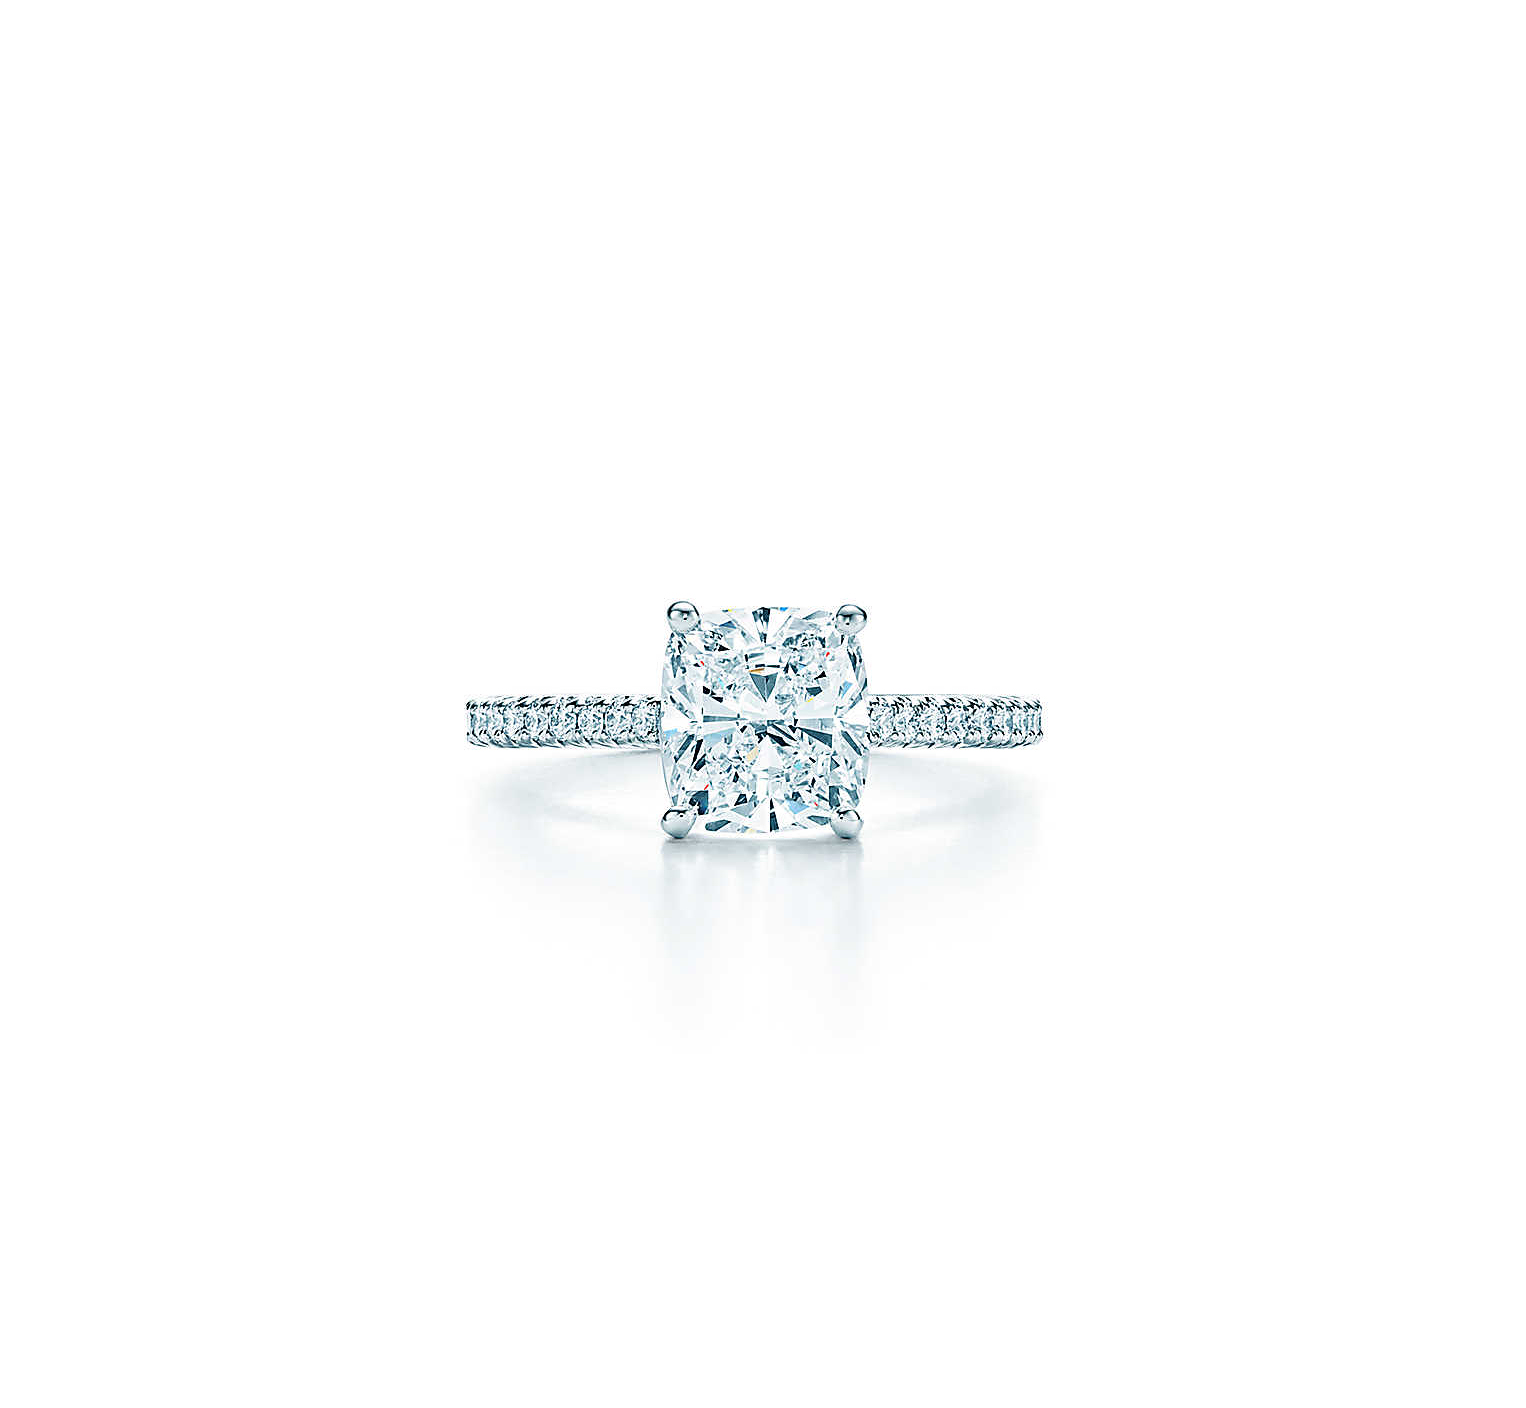 tiffany-novo-cushion-cut-diamond-pave-band-engagement-ring-0816.jpg